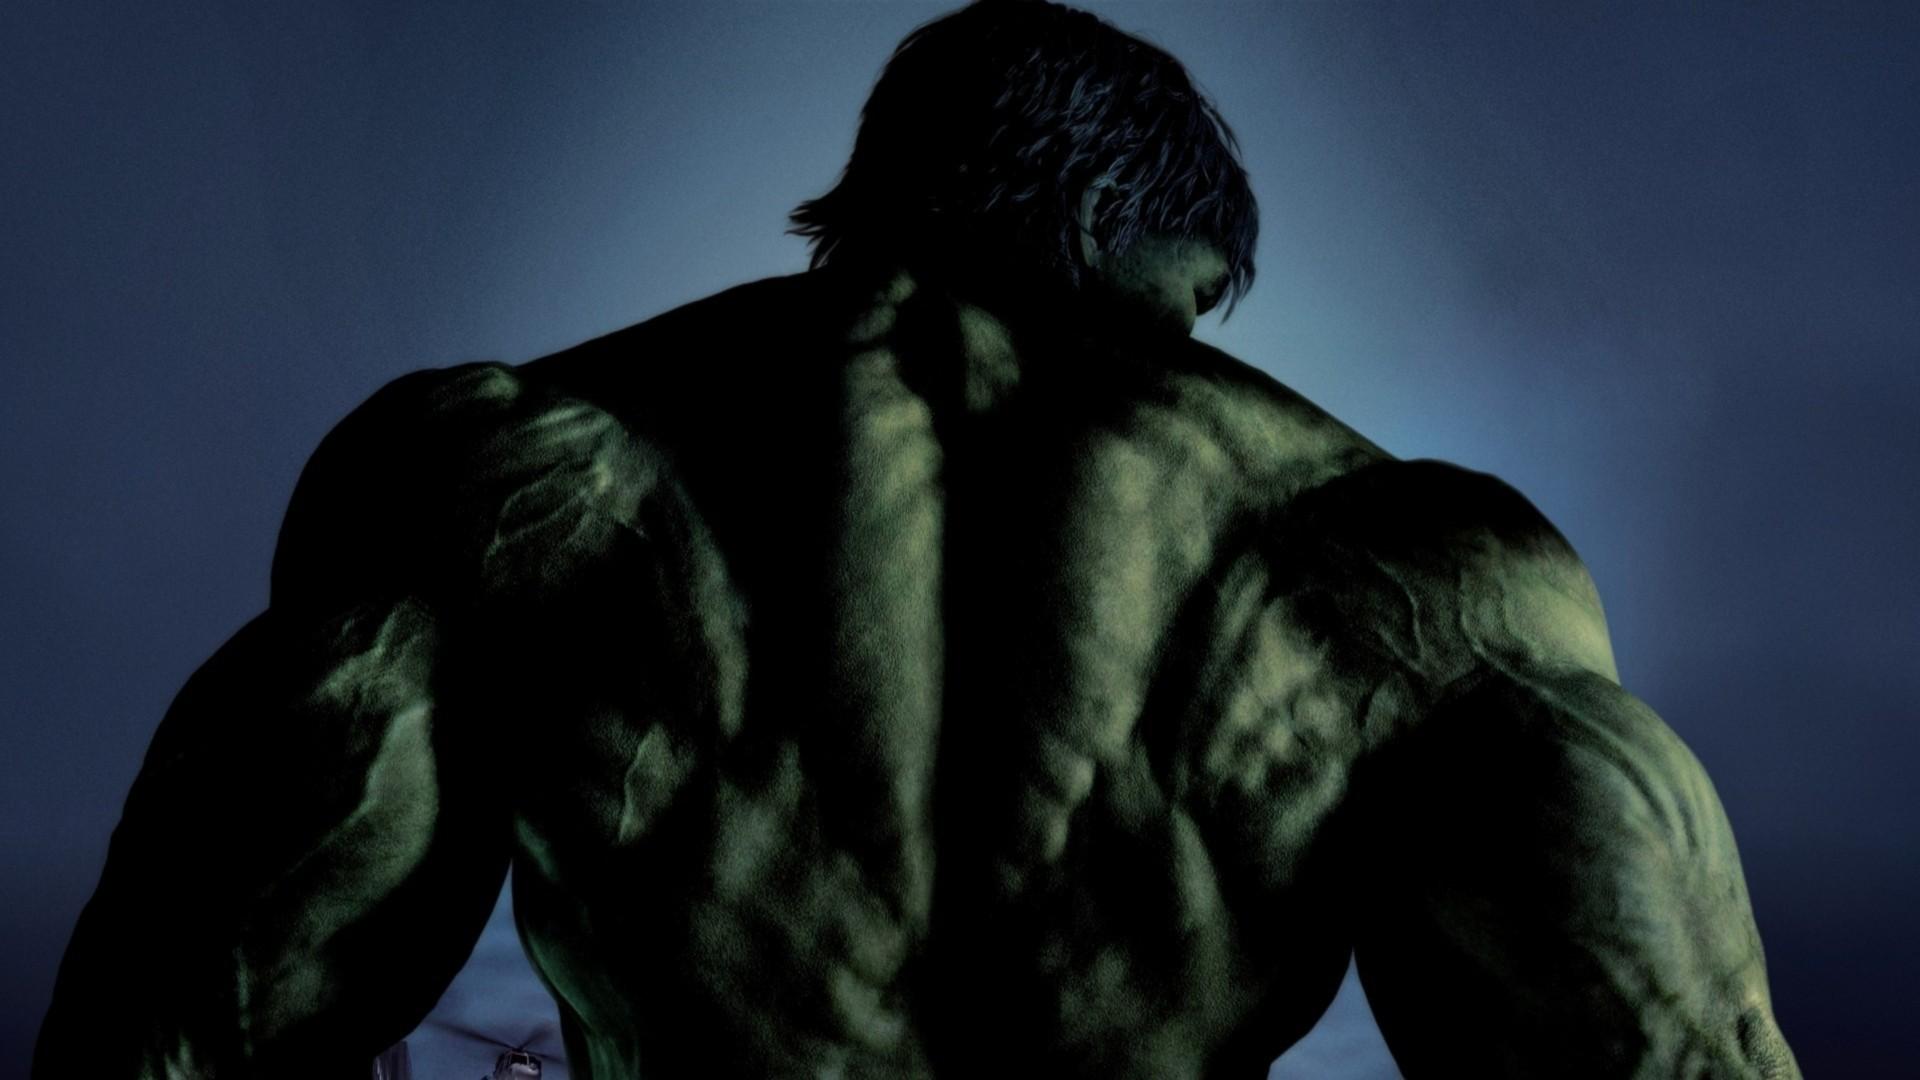 THE INCREDIBLE HULK superhero marvel f wallpaper 1920x1080 102893 1920x1080